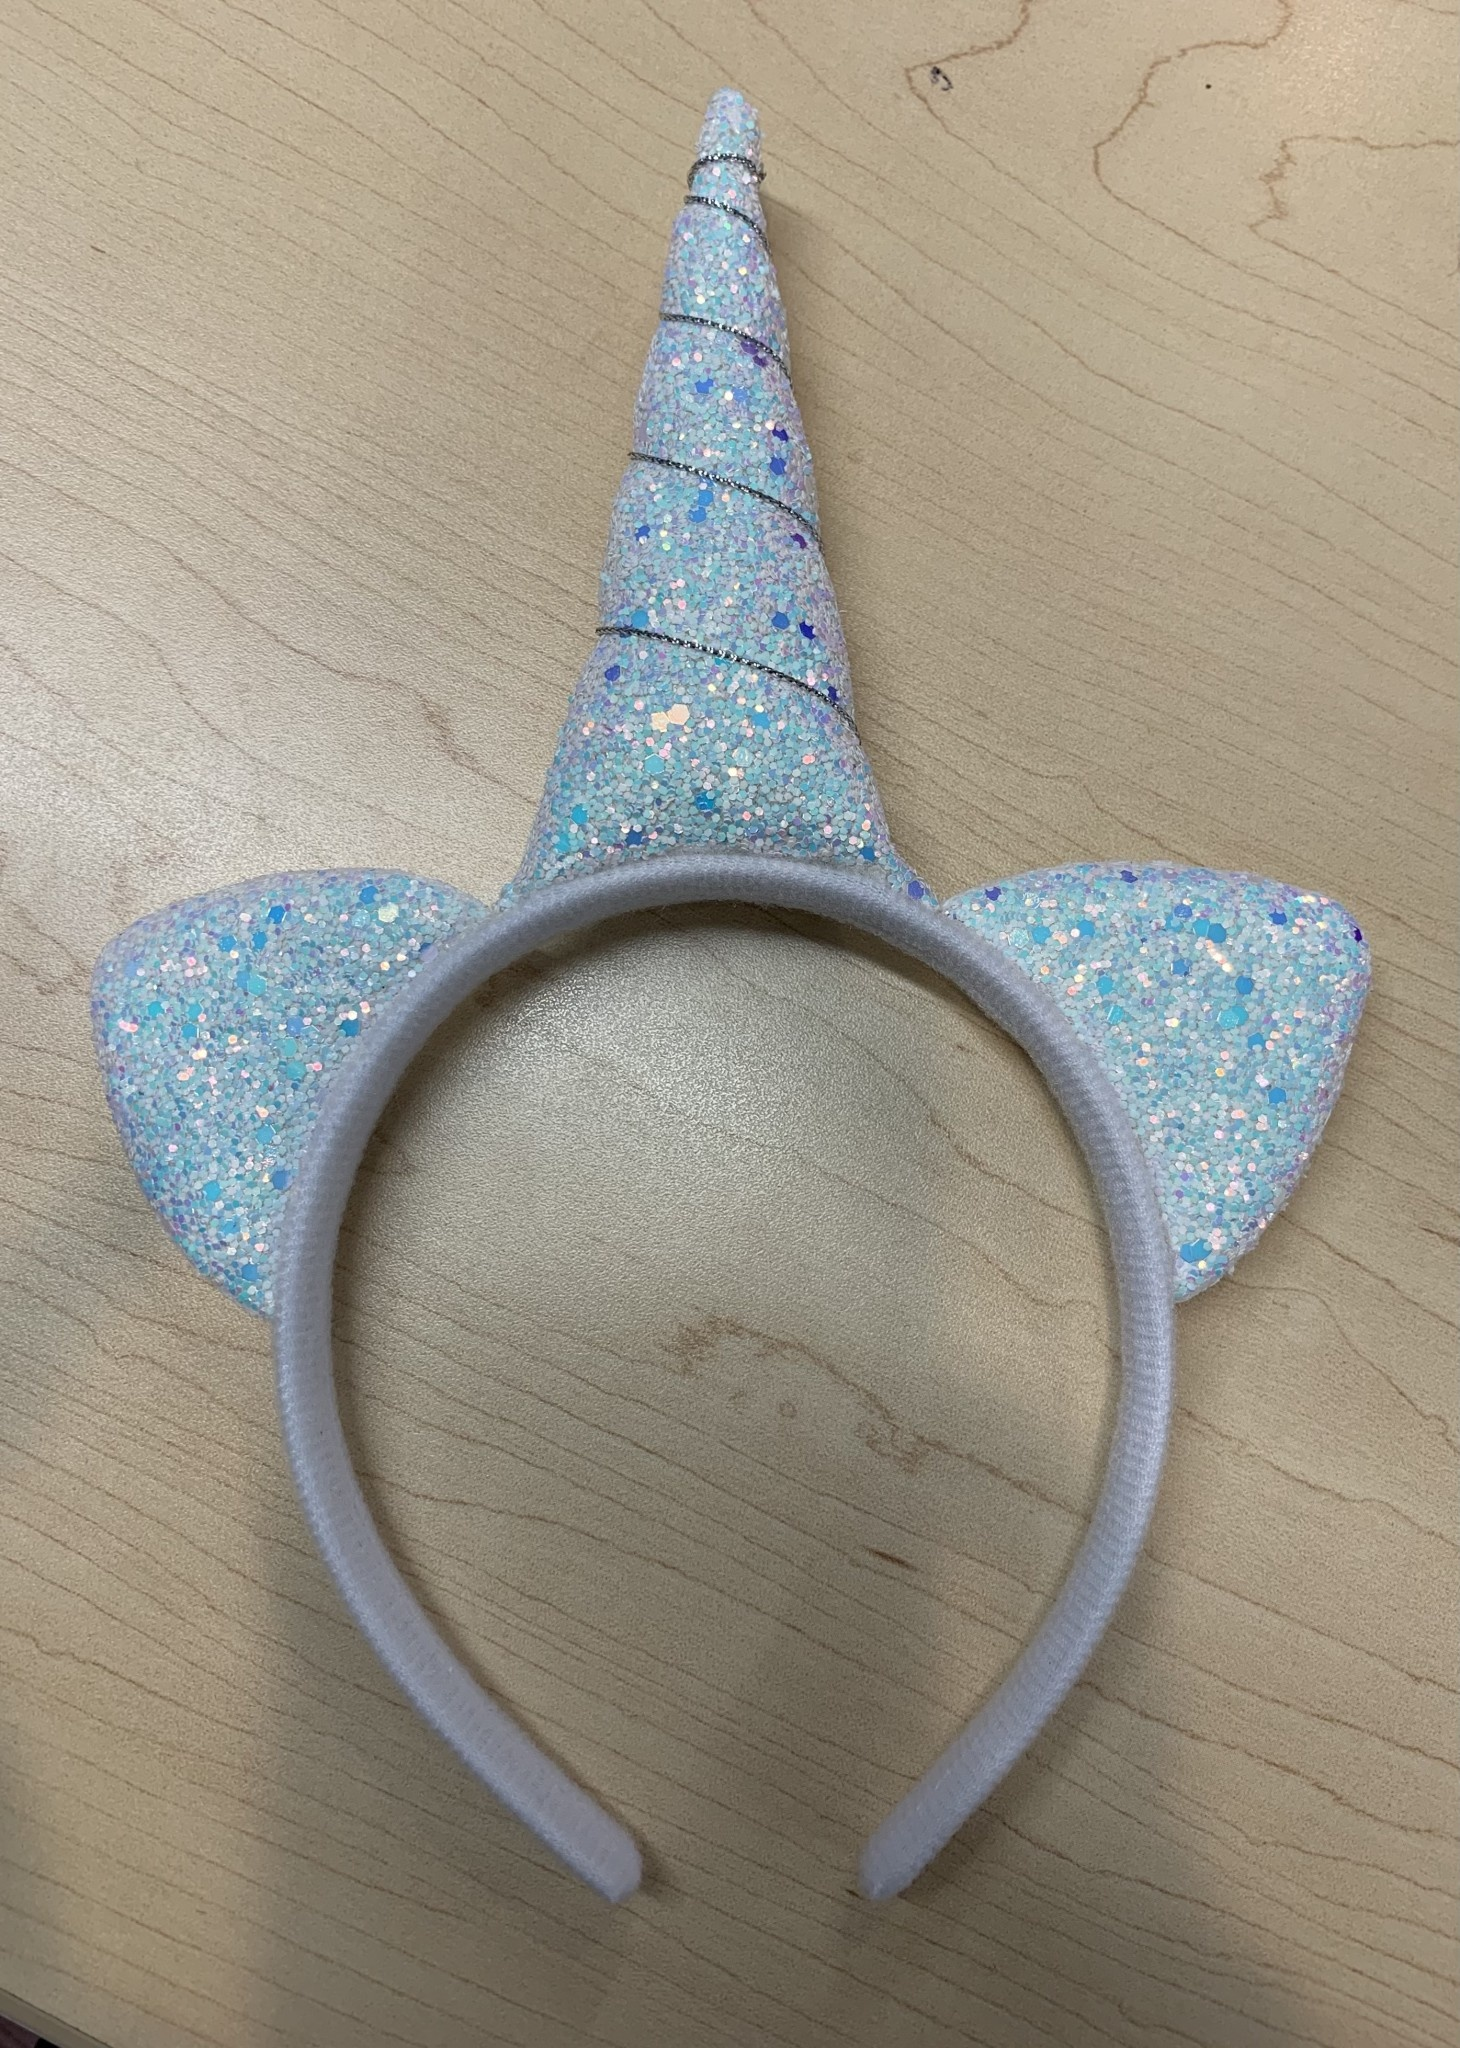 Headband: Squishy Glitter Unicorn